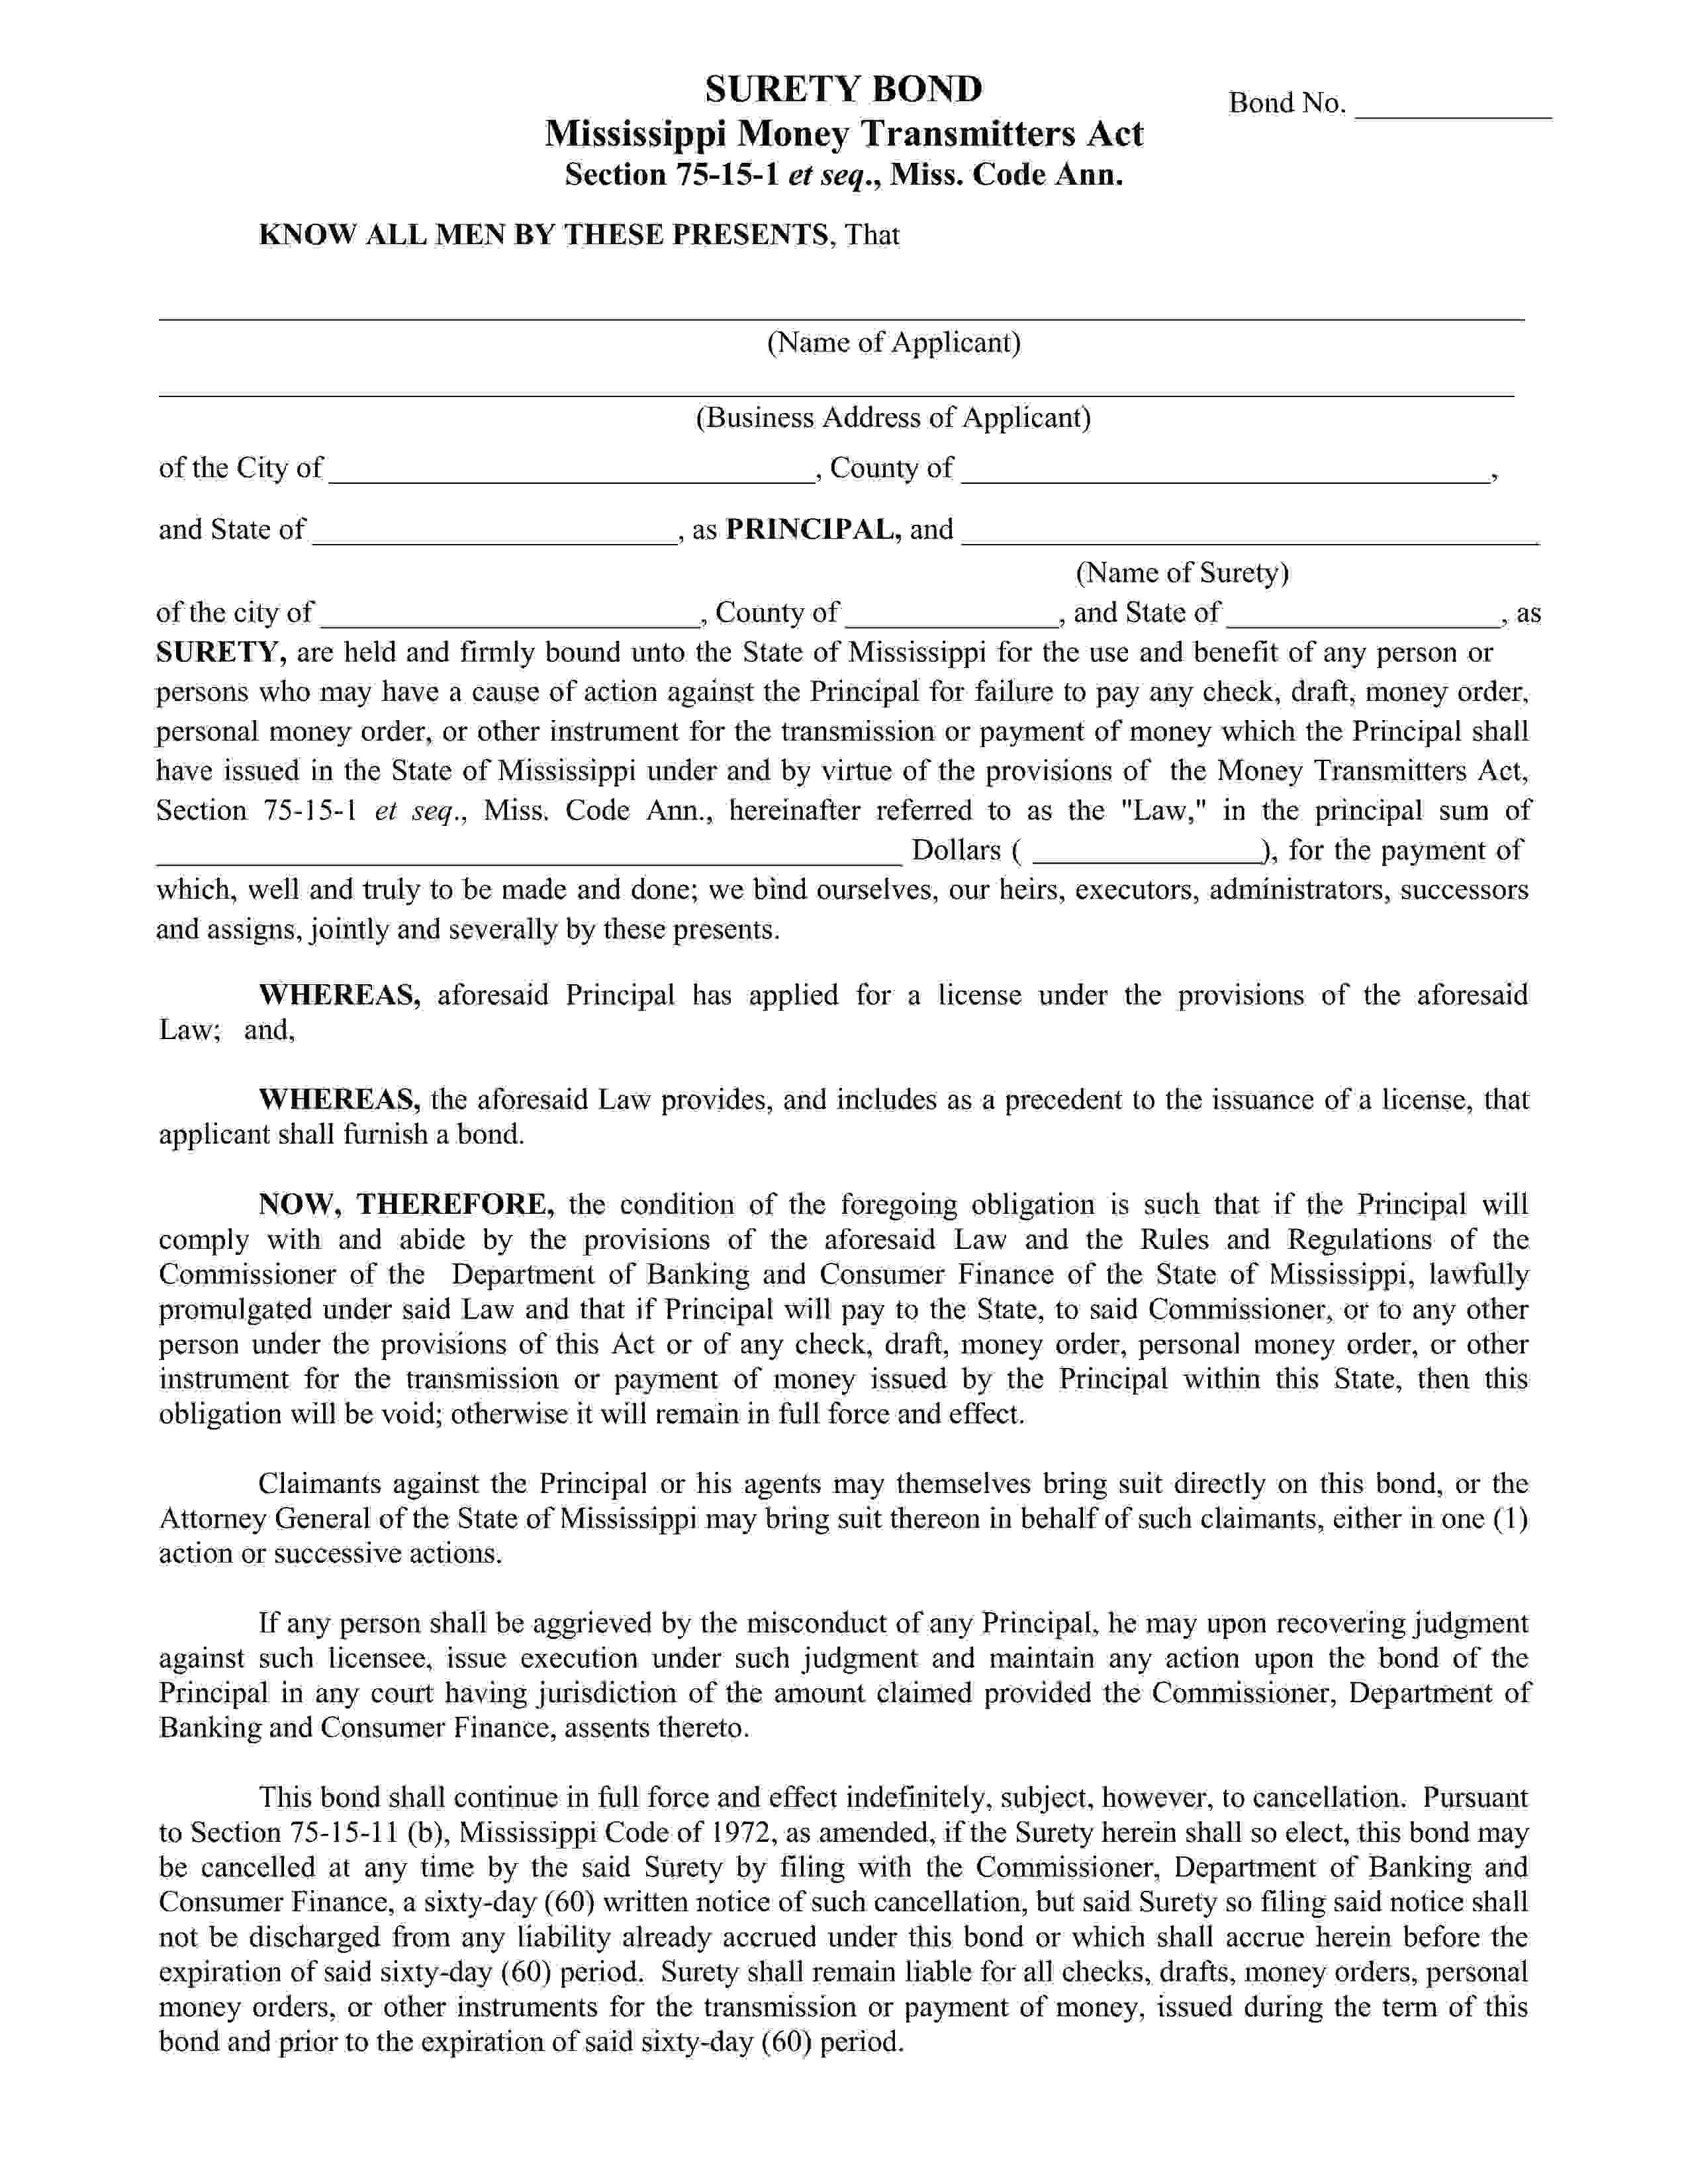 Mississippi Department of Banking and Consumer Finance Money Transmitter Bond sample image